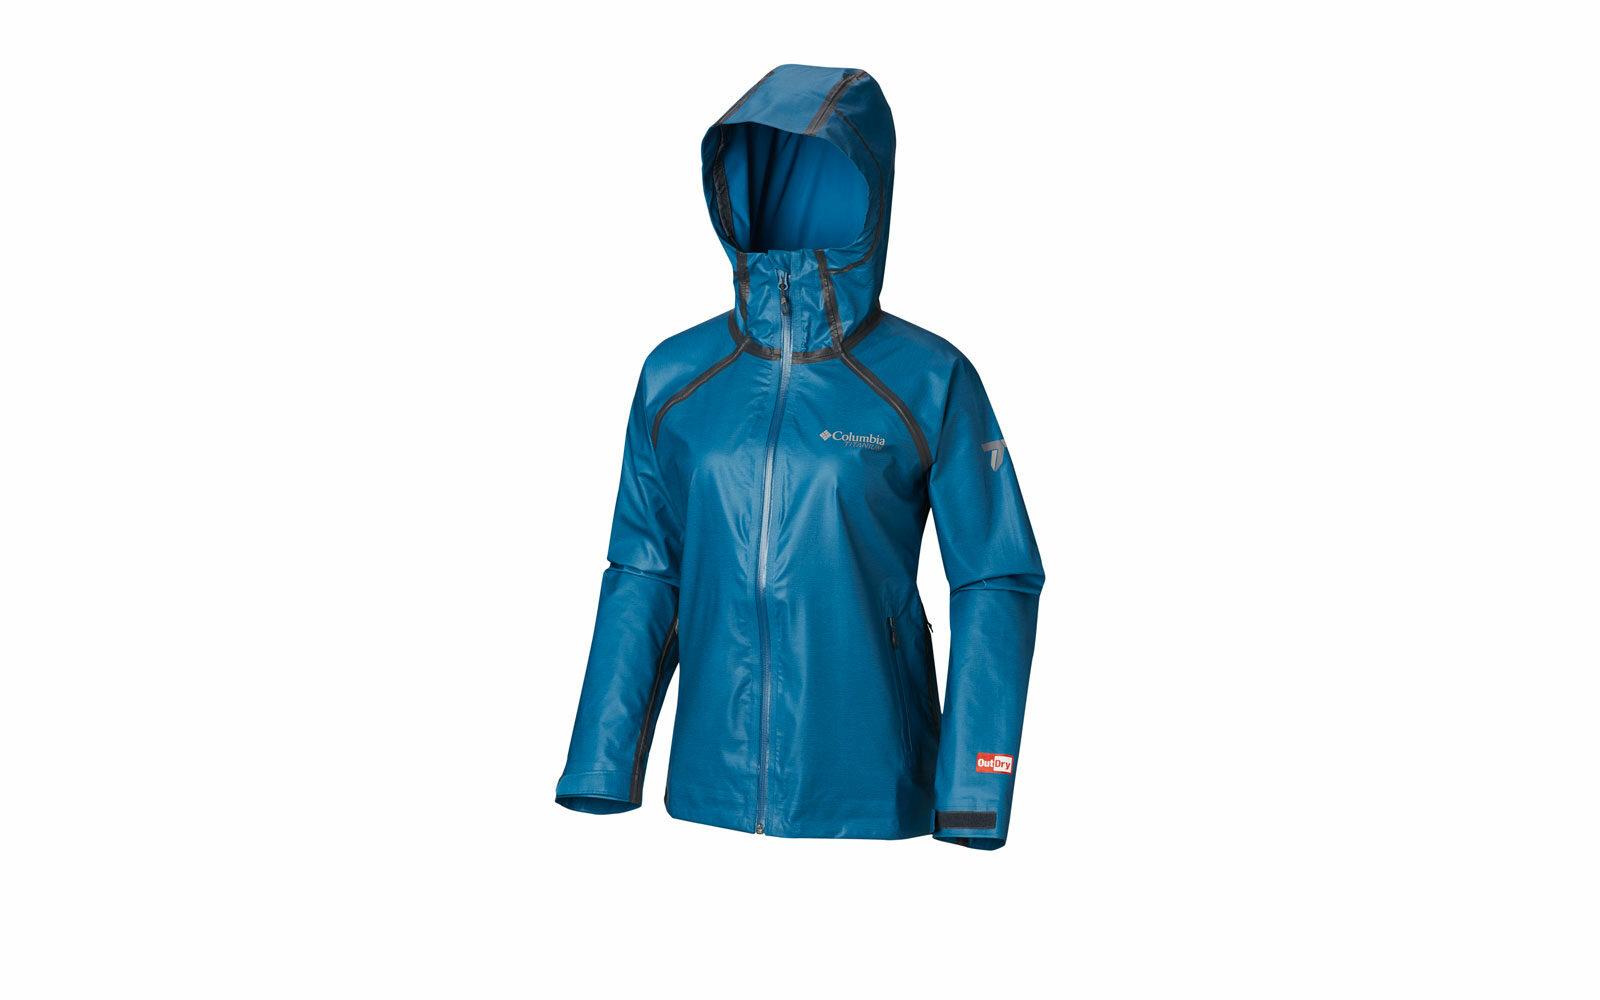 Columbia OutDry ex Reing, giacca antipioggia impermeabile e traspirante, cuciture termosaldate, ventilazione ascellare, multiregolazioni, euro 169,99